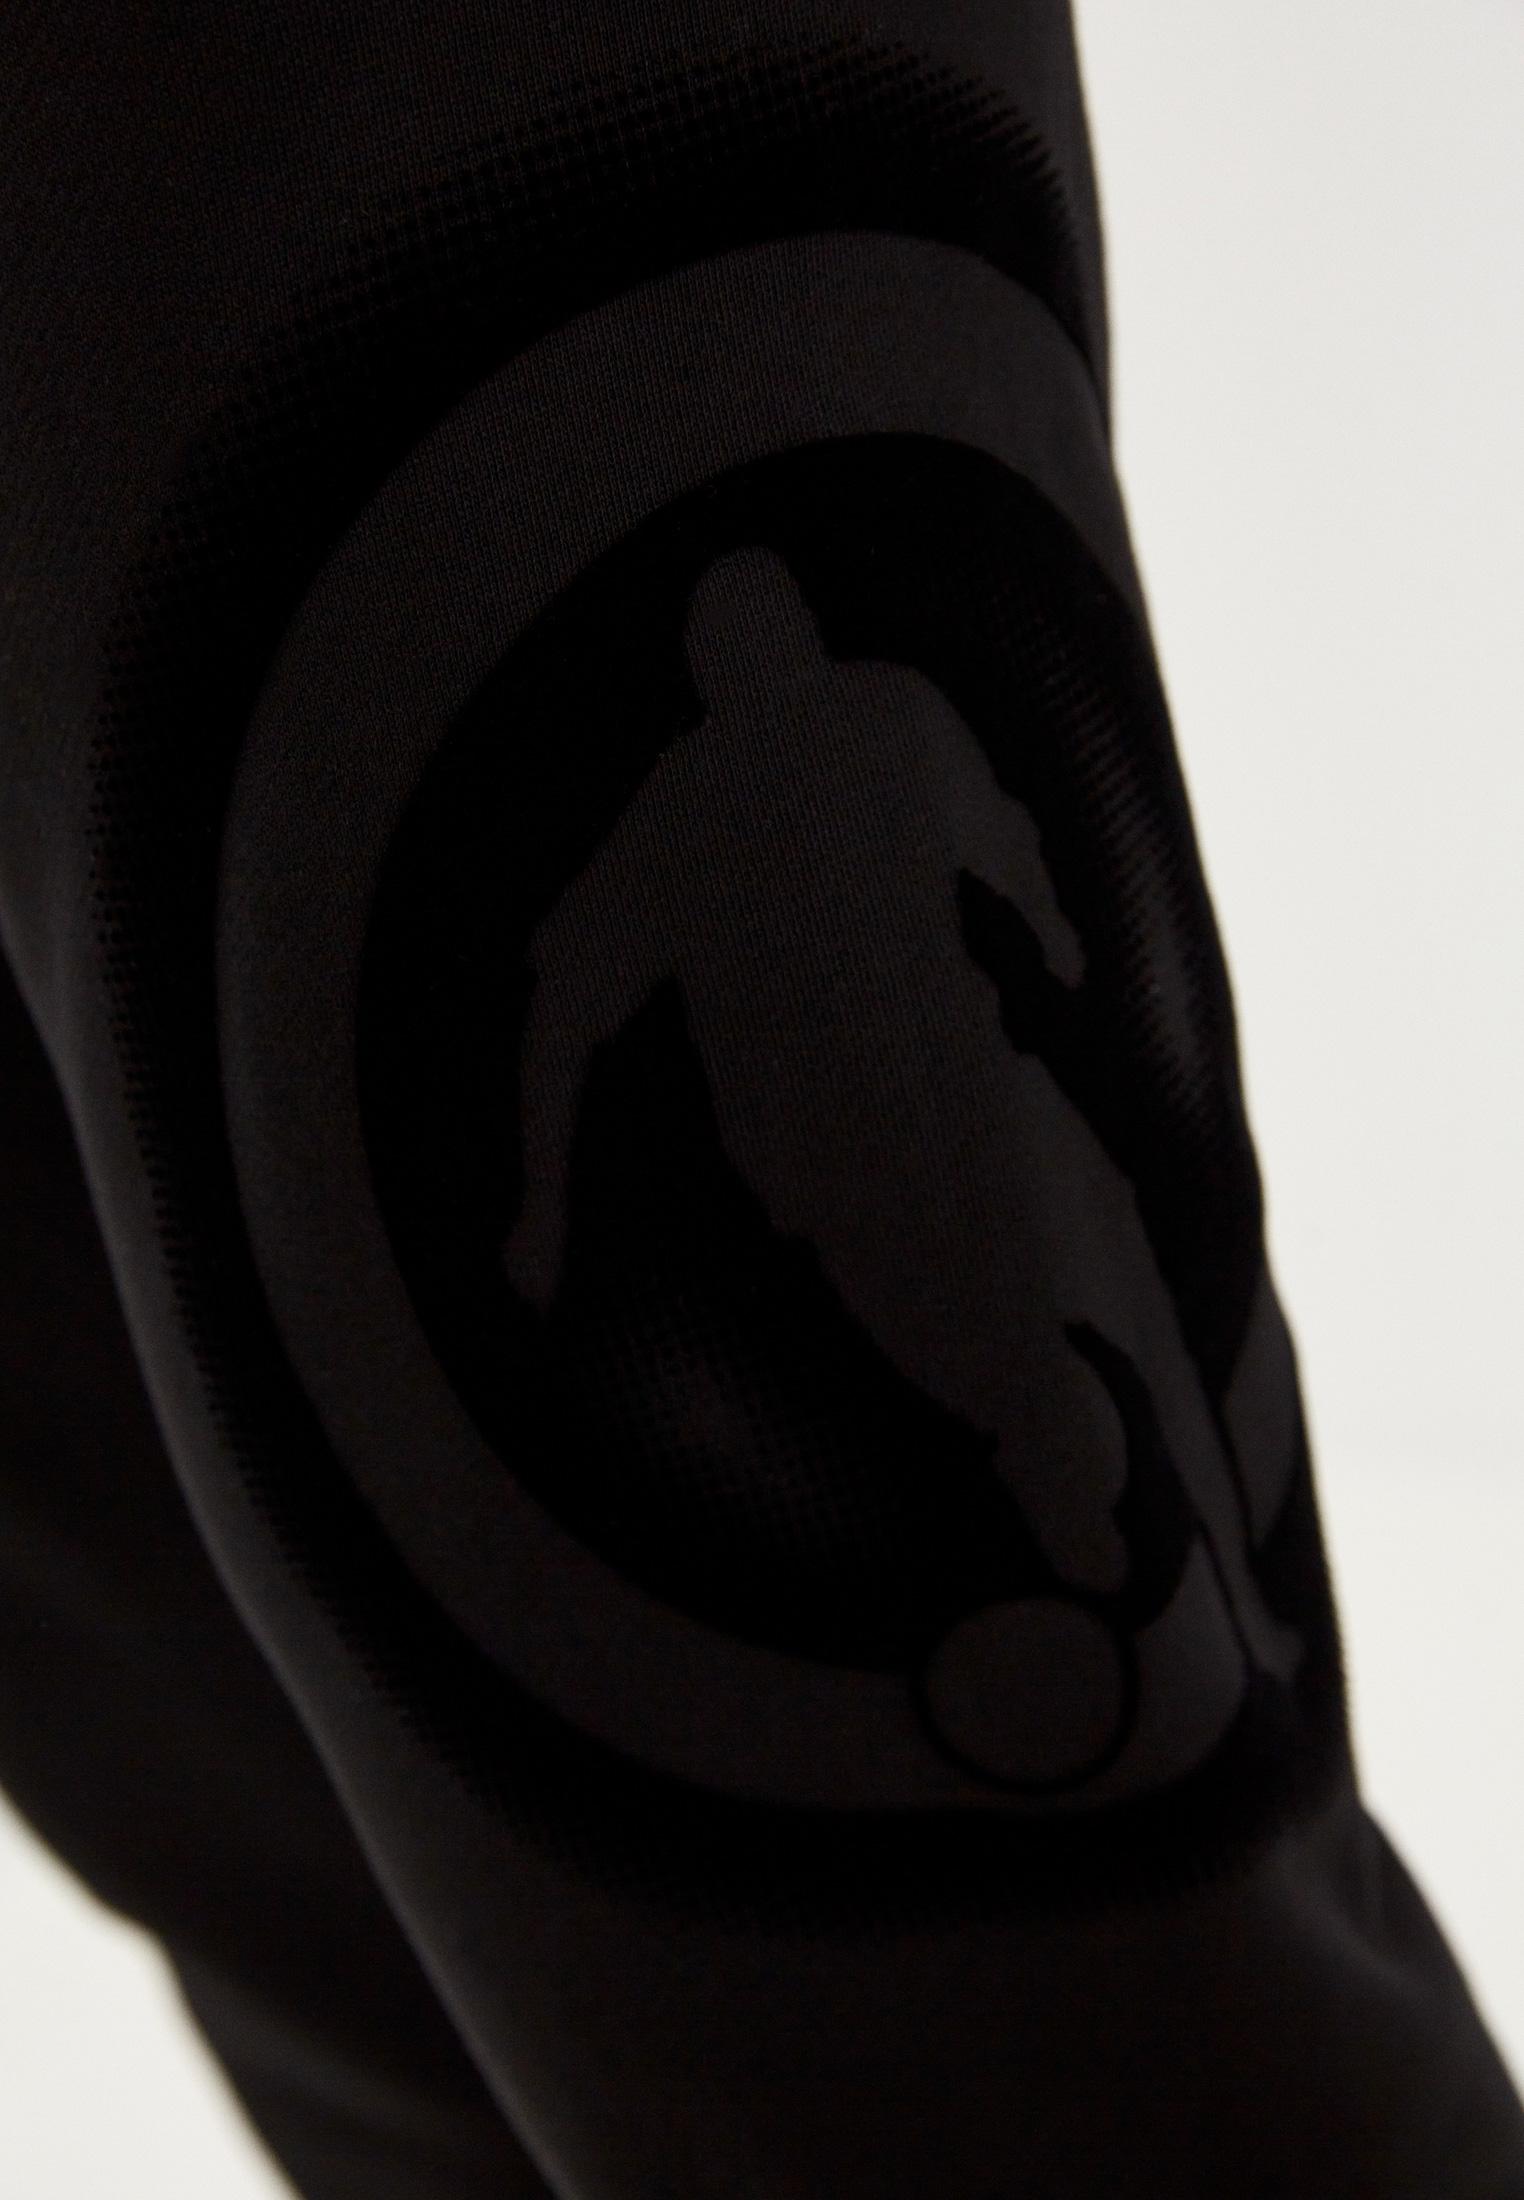 Мужские спортивные брюки Bikkembergs (Биккембергс) C 1 159 1T M 4121: изображение 5